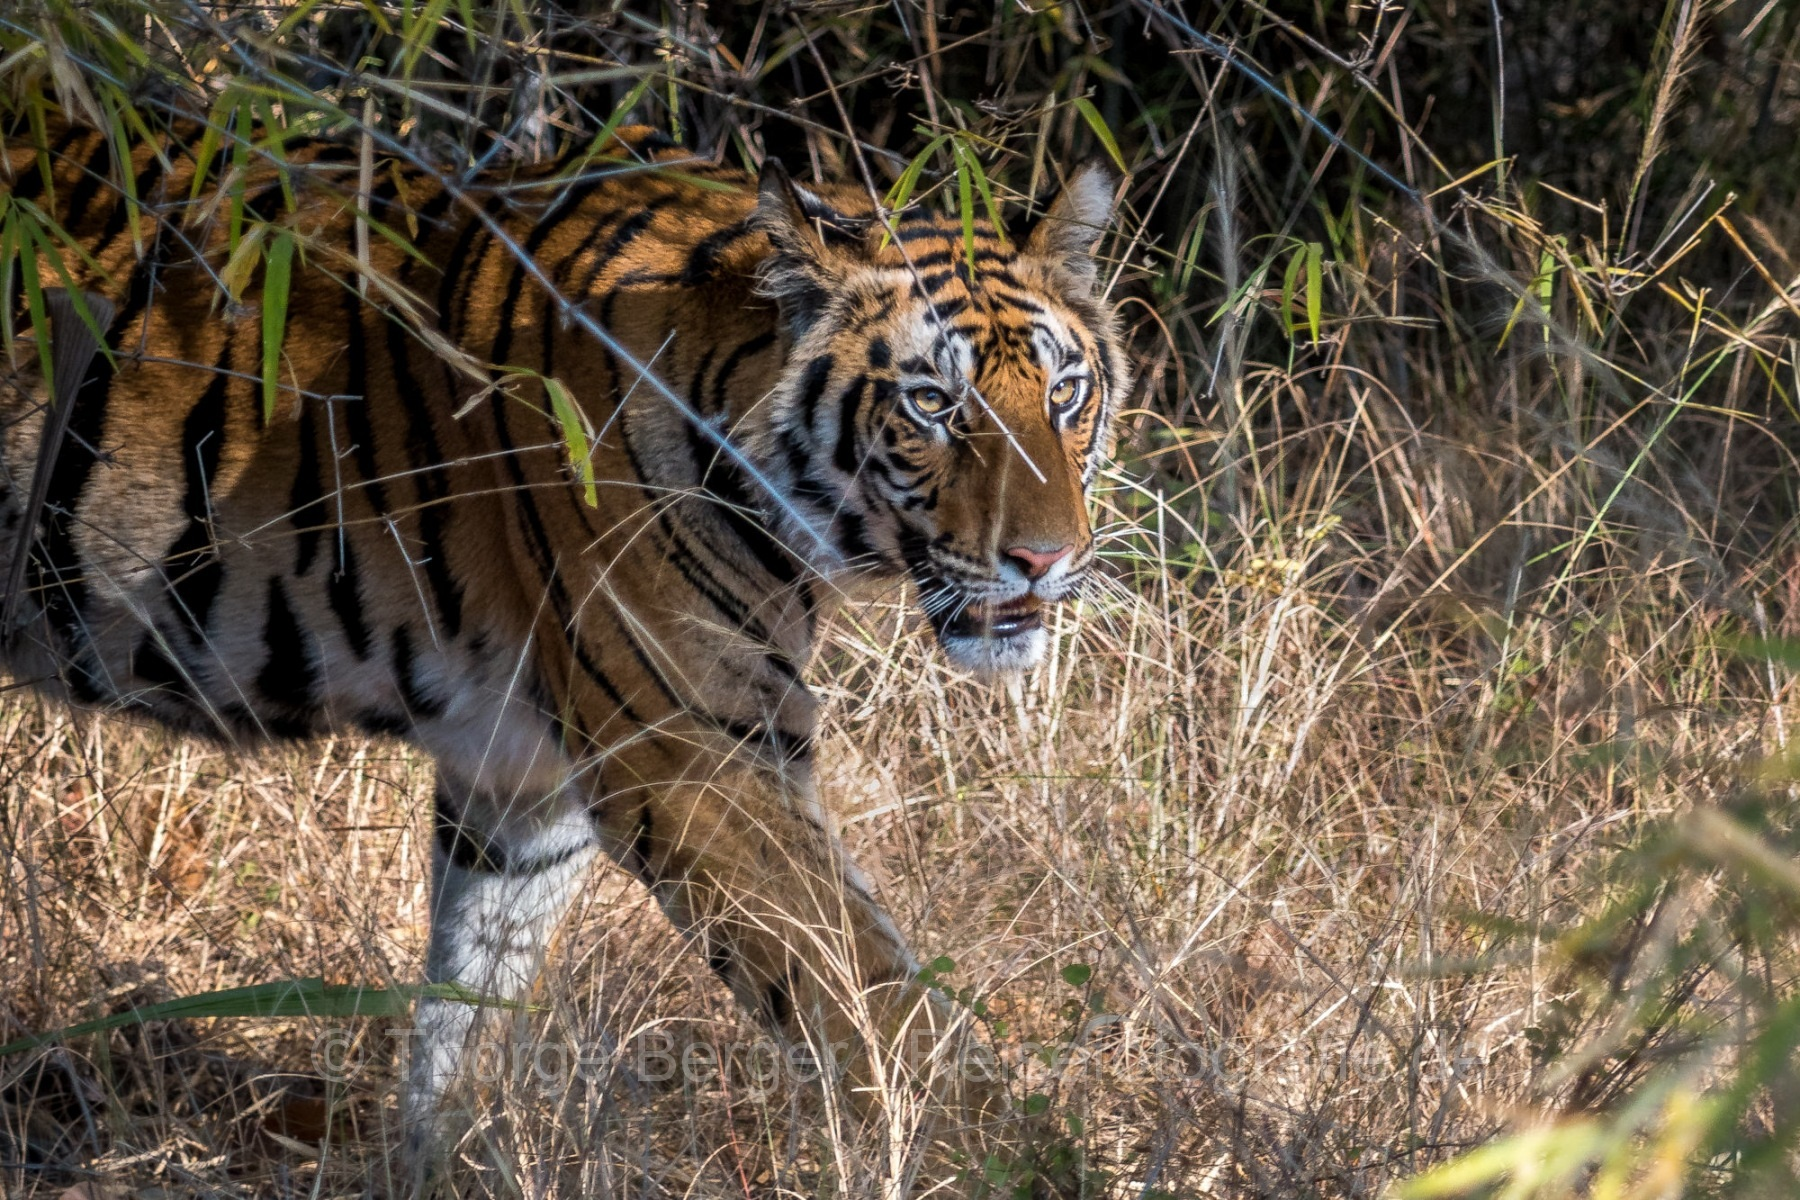 Tiger in Bhandavgarh National Park